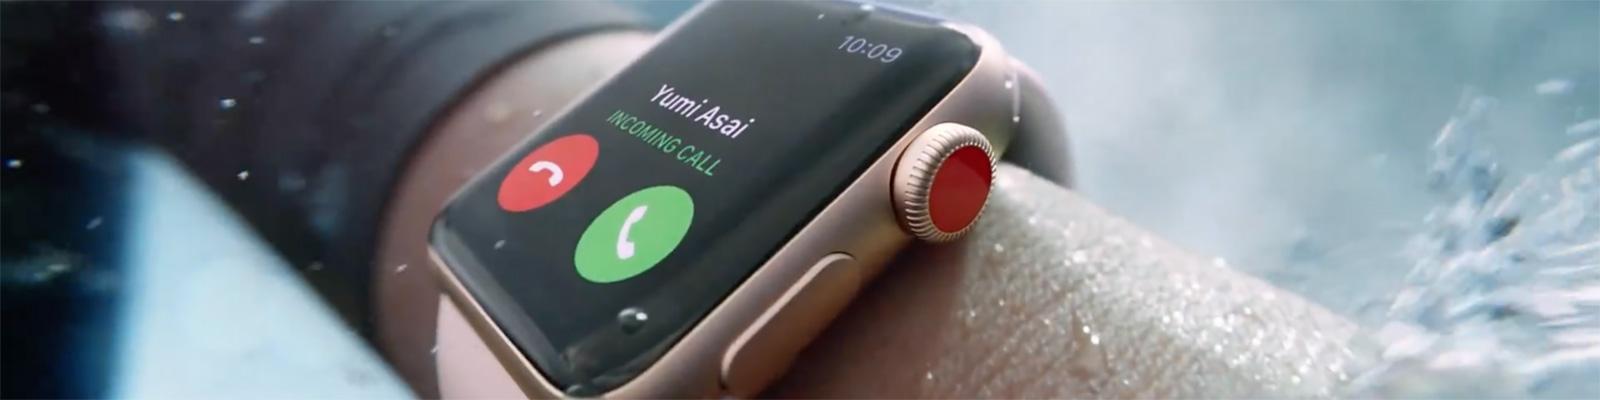 Apple Watch Series 3 — Surf — Apple(Apple)